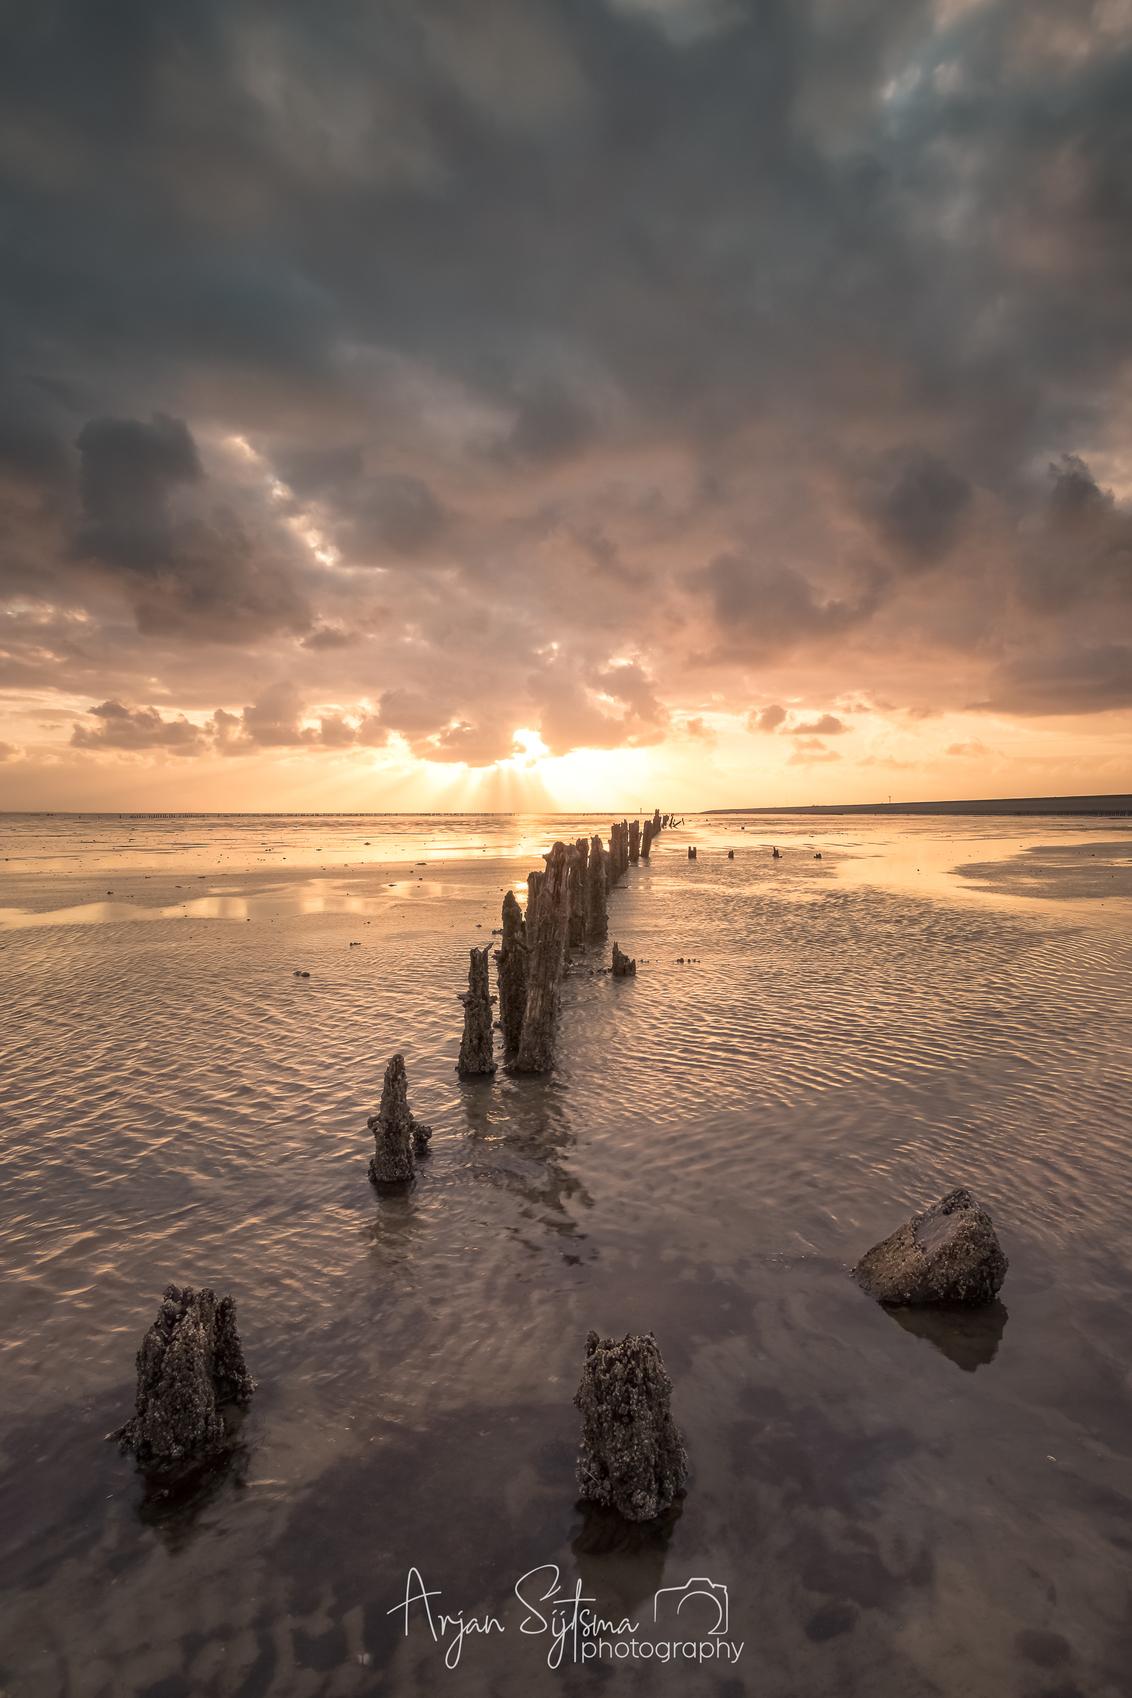 Na regen komt zonneschijn - - - foto door ArjanSijtsma op 14-05-2019 - deze foto bevat: lucht, wolken, zon, strand, zee, water, lente, regen, bui, licht, spiegeling, landschap, tegenlicht, zonsopkomst, zand, kust, eb, zonlicht, wadden, waddenzee, wad, regenbui, wierum, lange sluitertijd, laag water